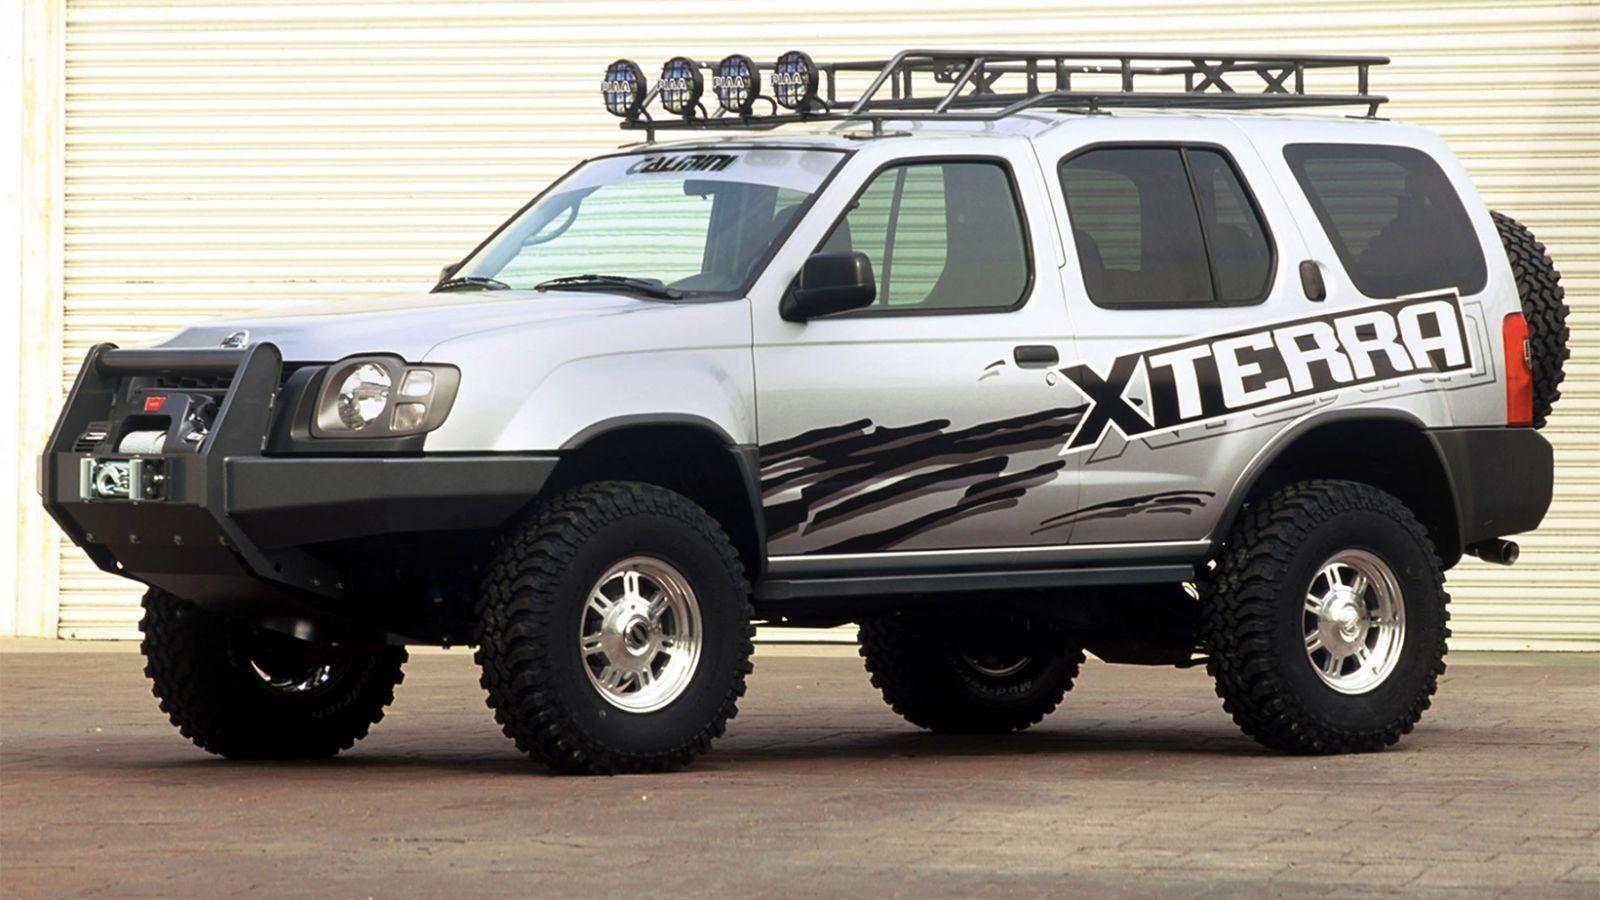 Image Result For Xterra Nissan Xterra Nissan Nissan Terrano